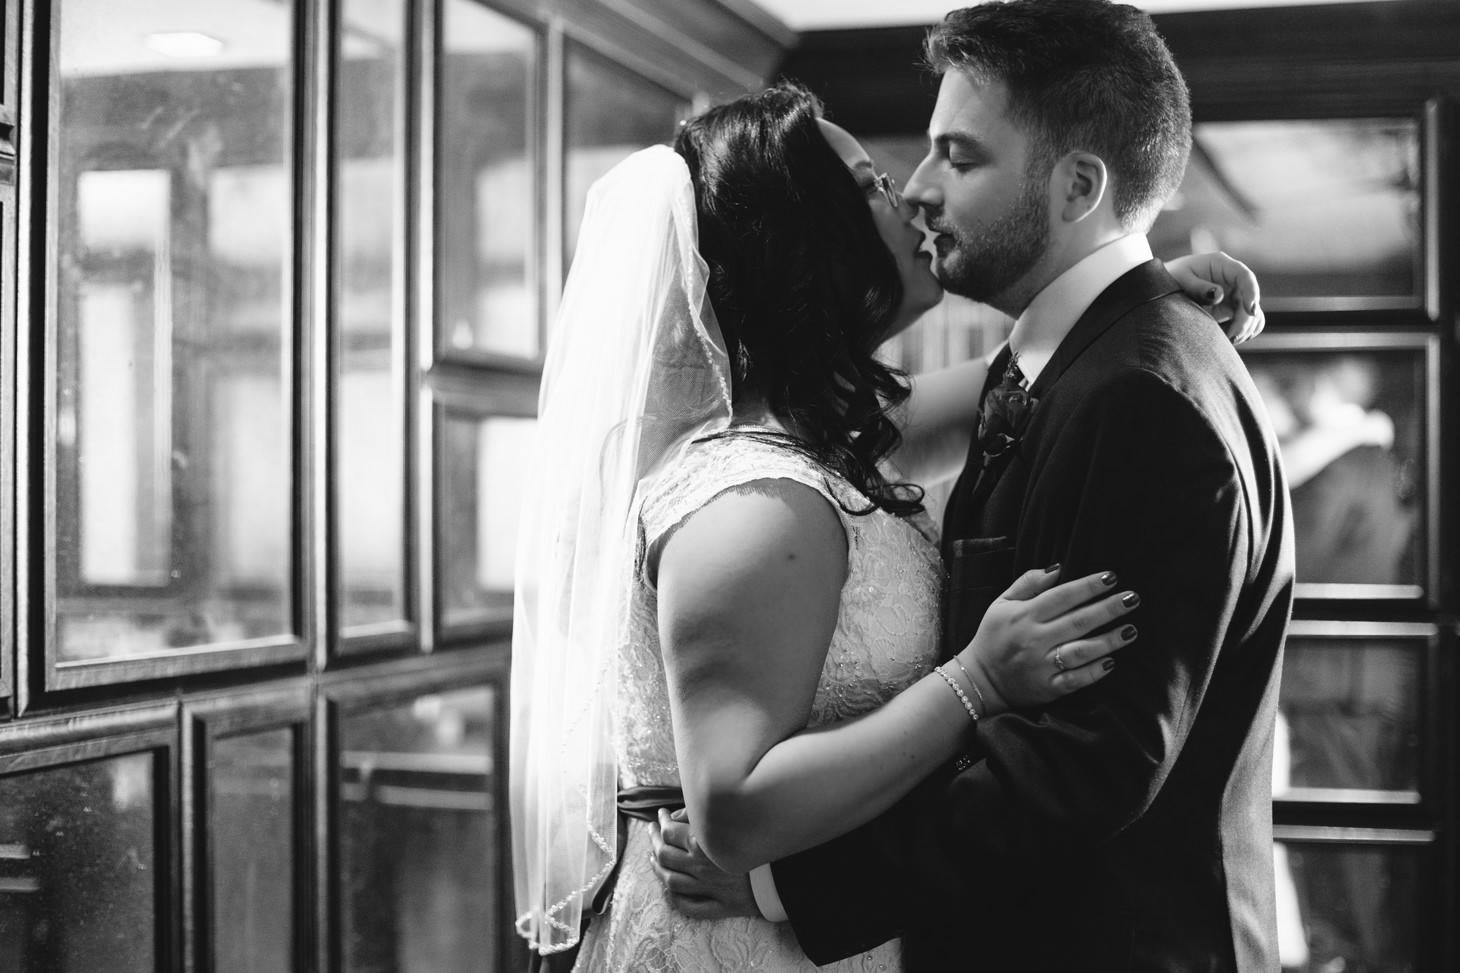 022-nyc-wedding-portrait-photographer-times-square-muse-hotel-winter-wedding-smitten-chickens.jpg